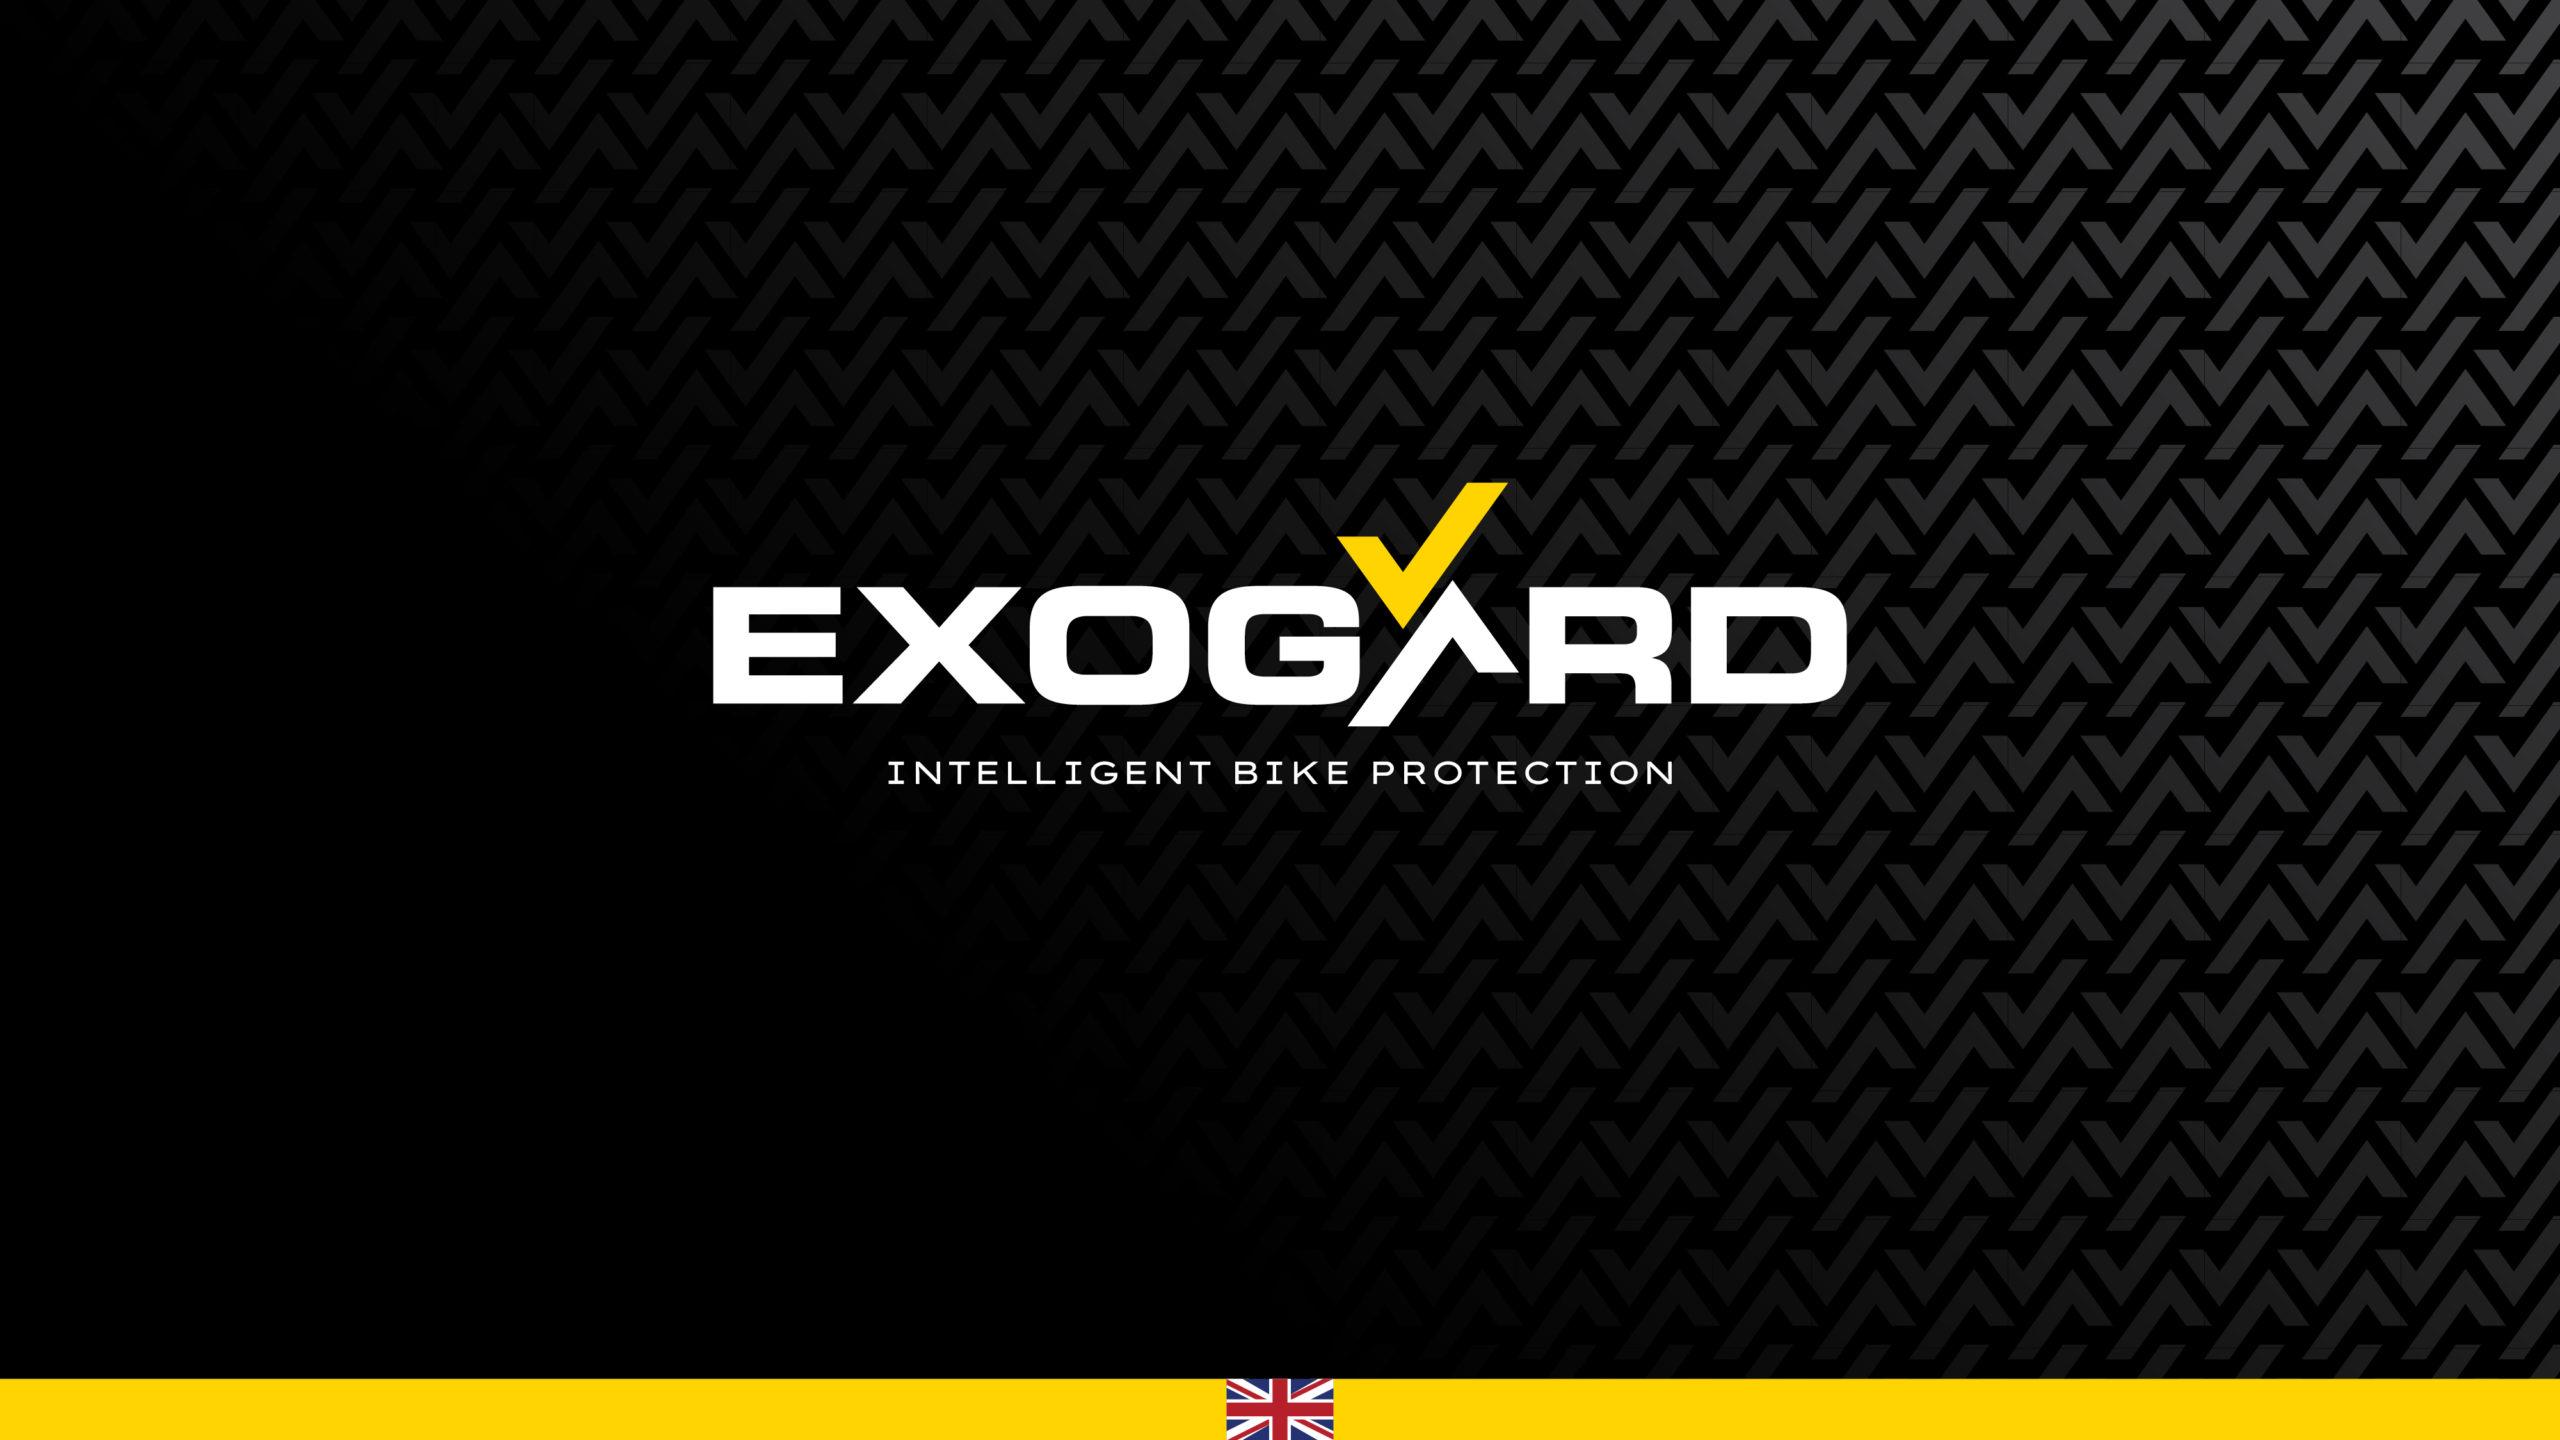 Exogard Visual Identity Title Screen